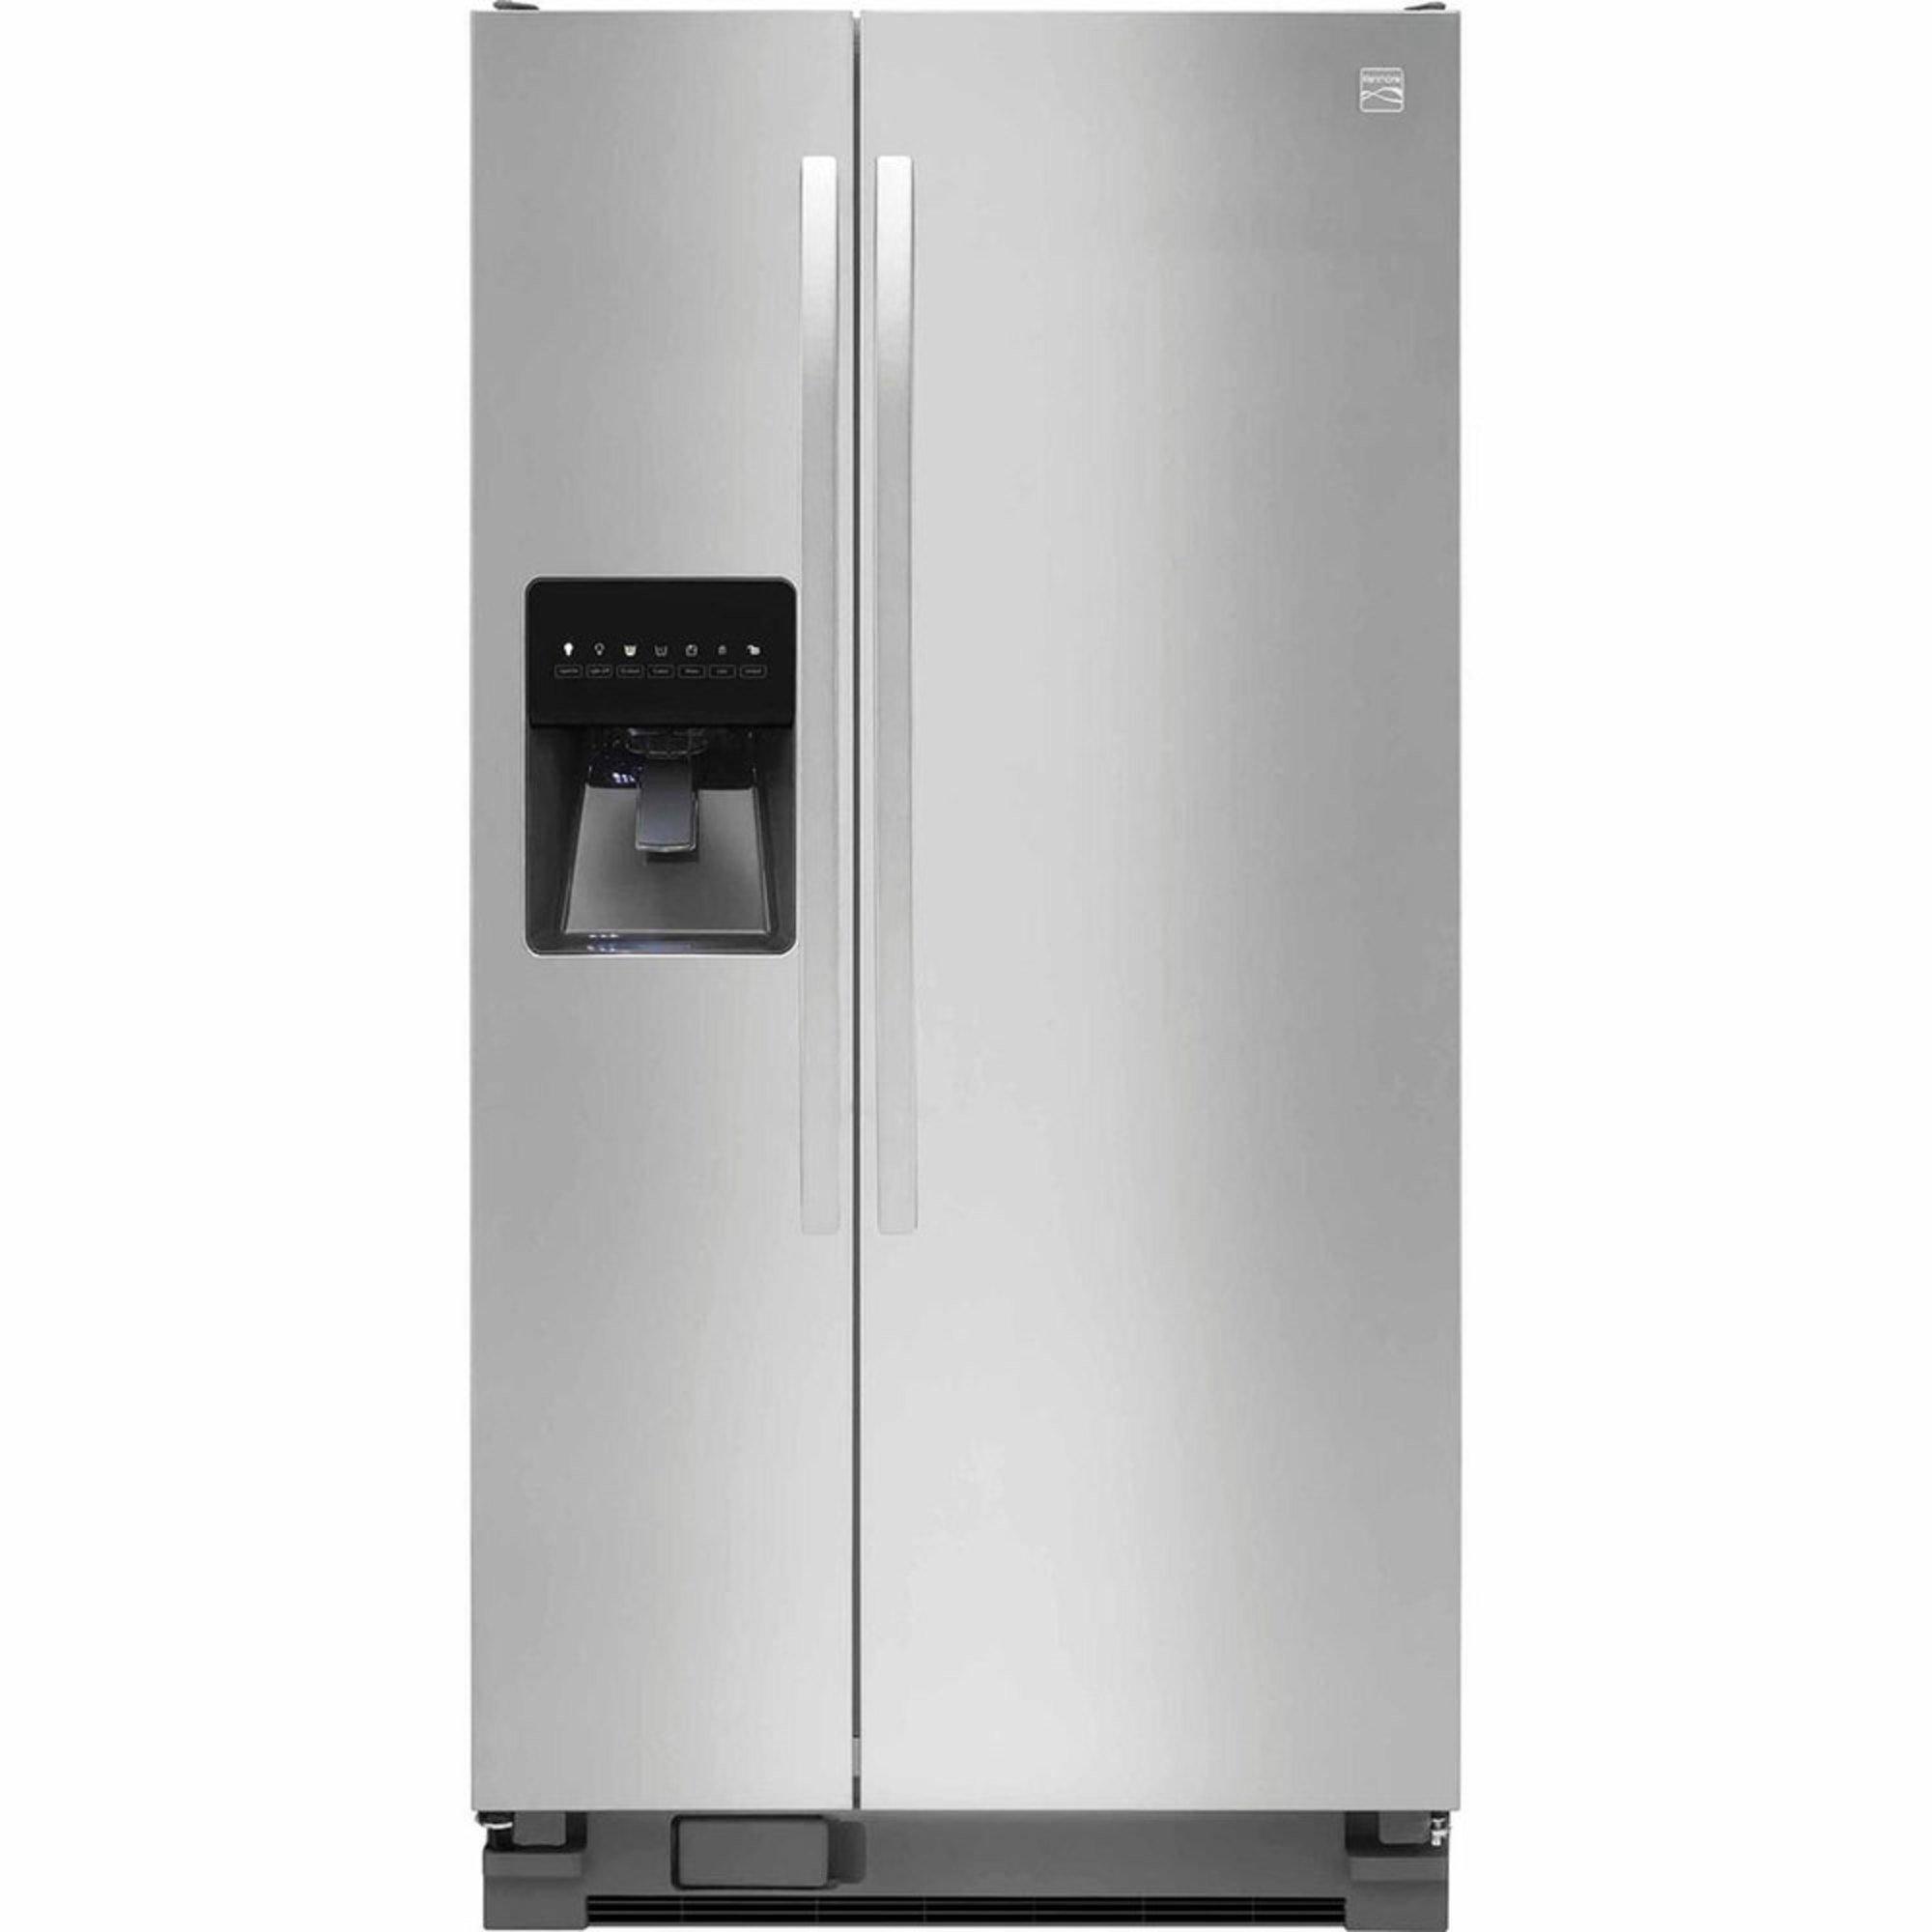 kenmore fridge stainless steel. kenmore fridge stainless steel s